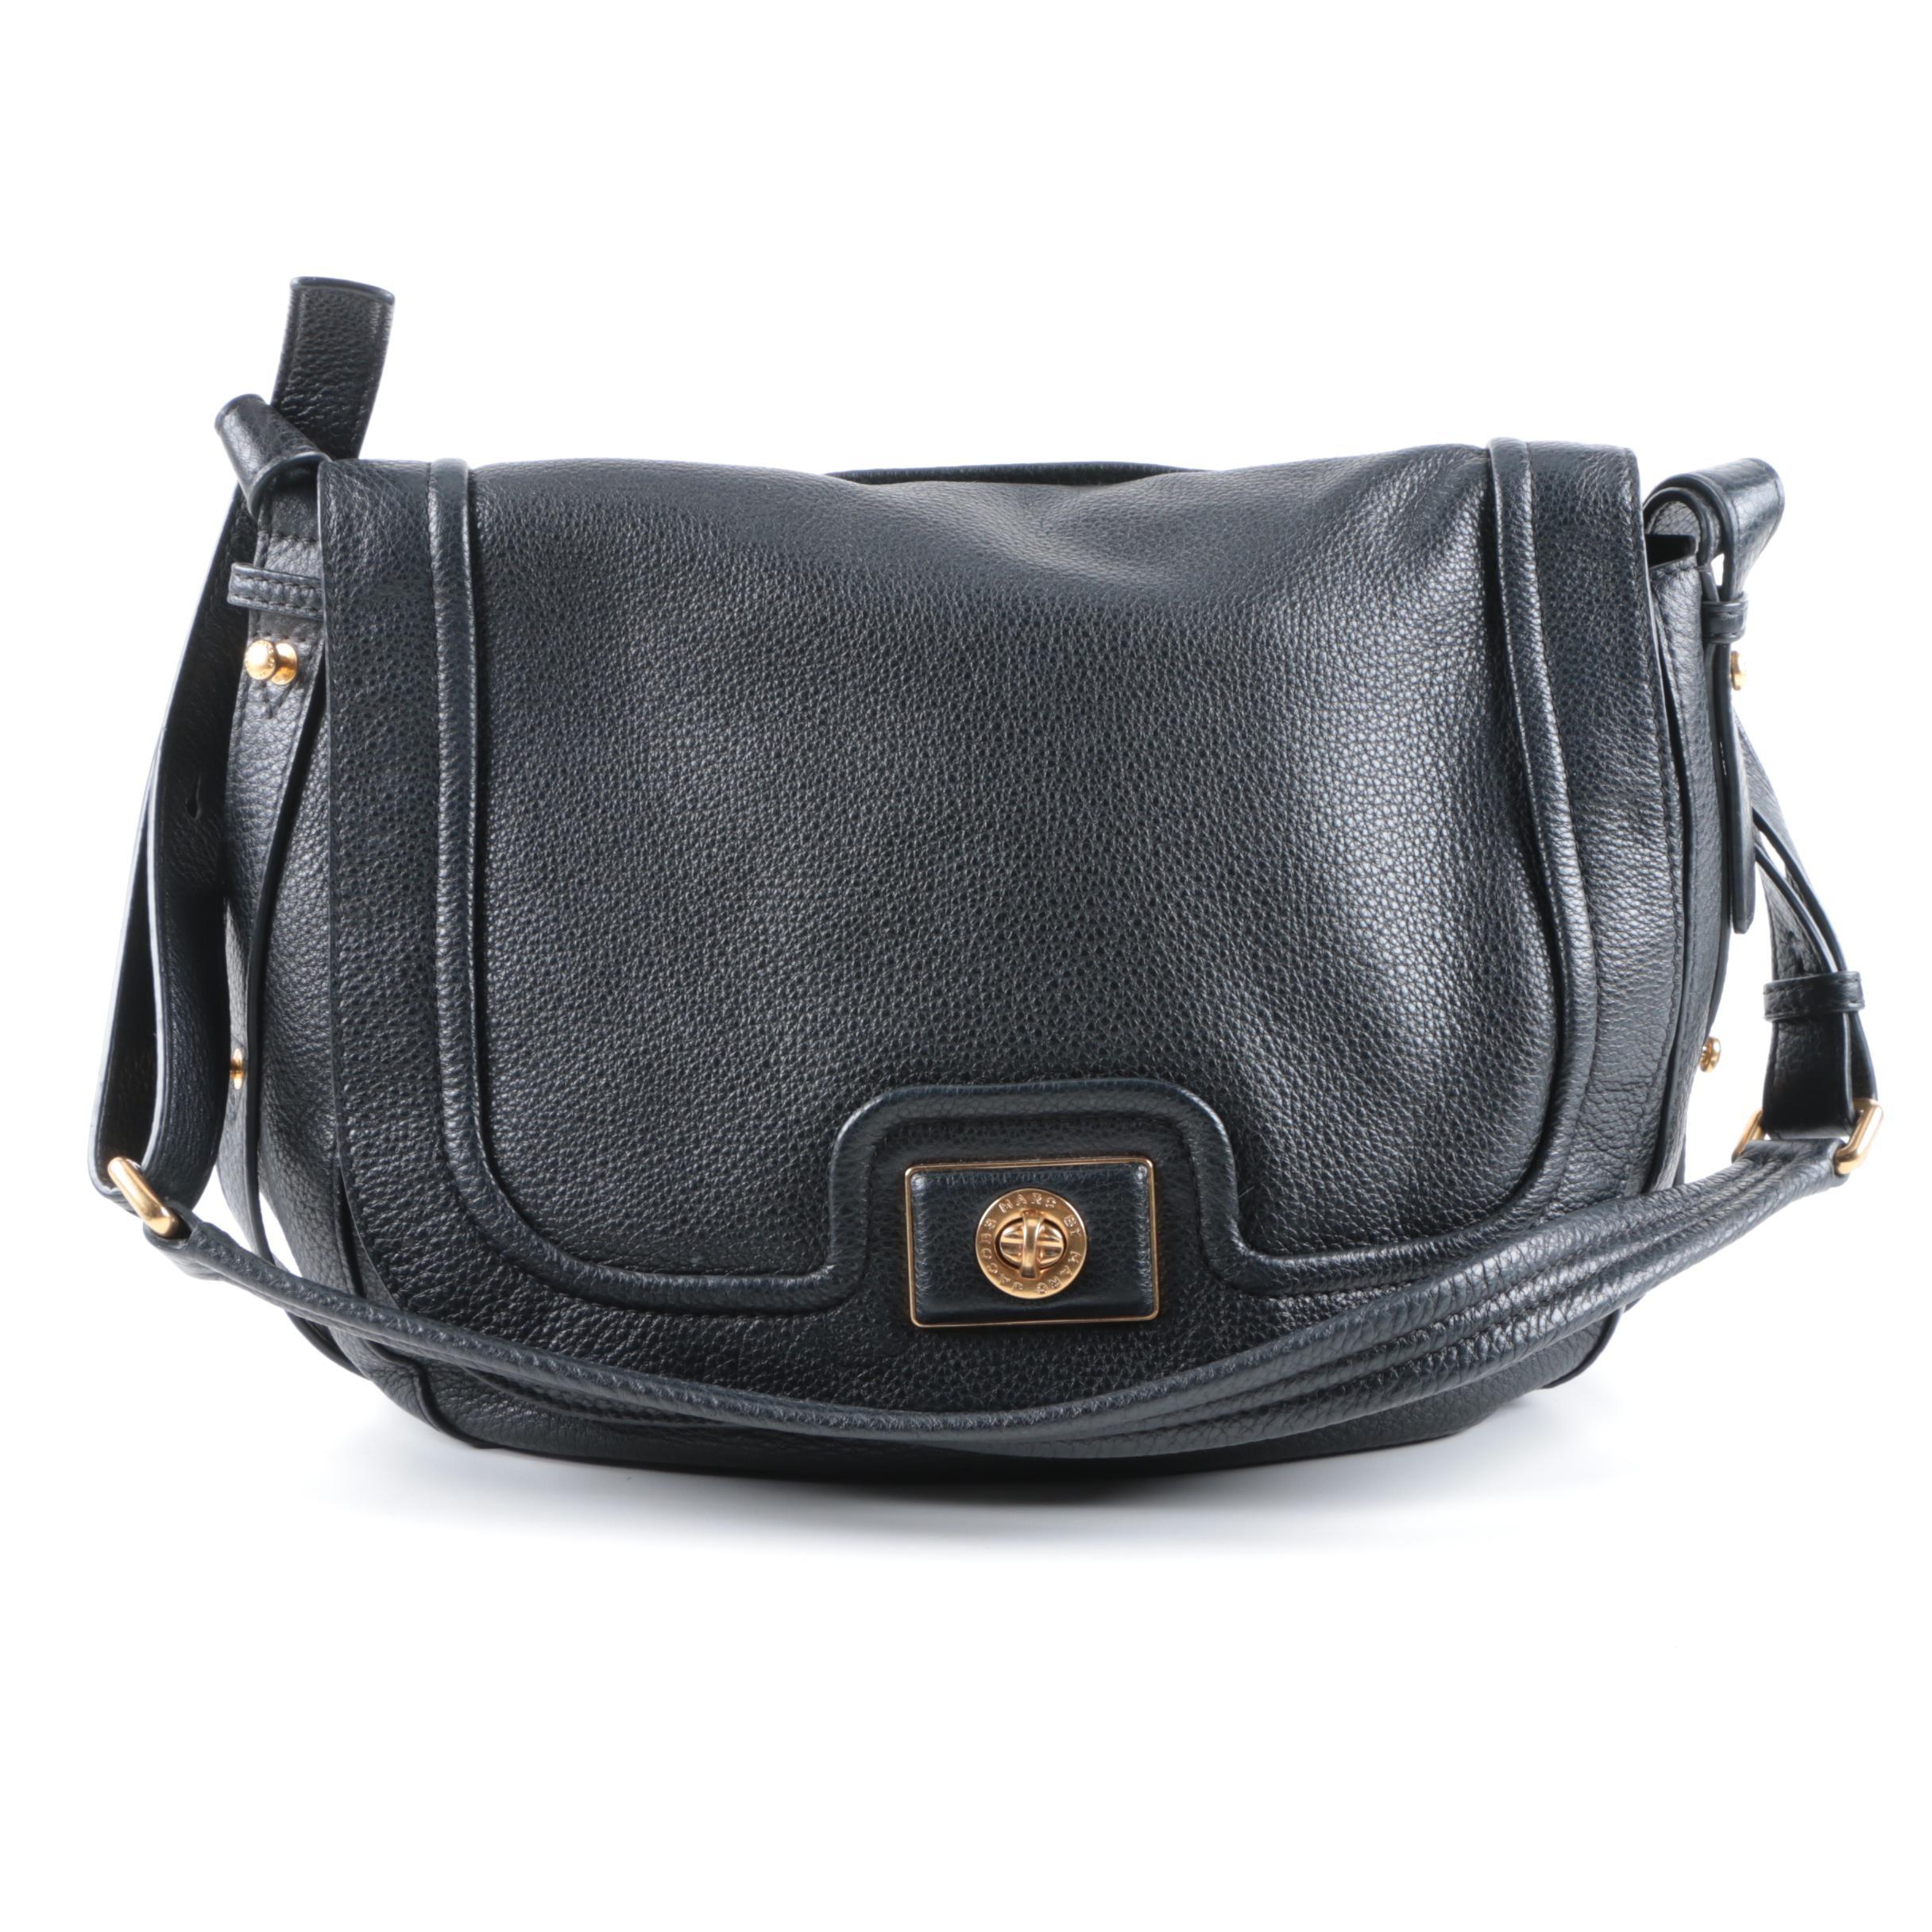 Marc by Marc Jacobs Black Grained Leather Shoulder Bag